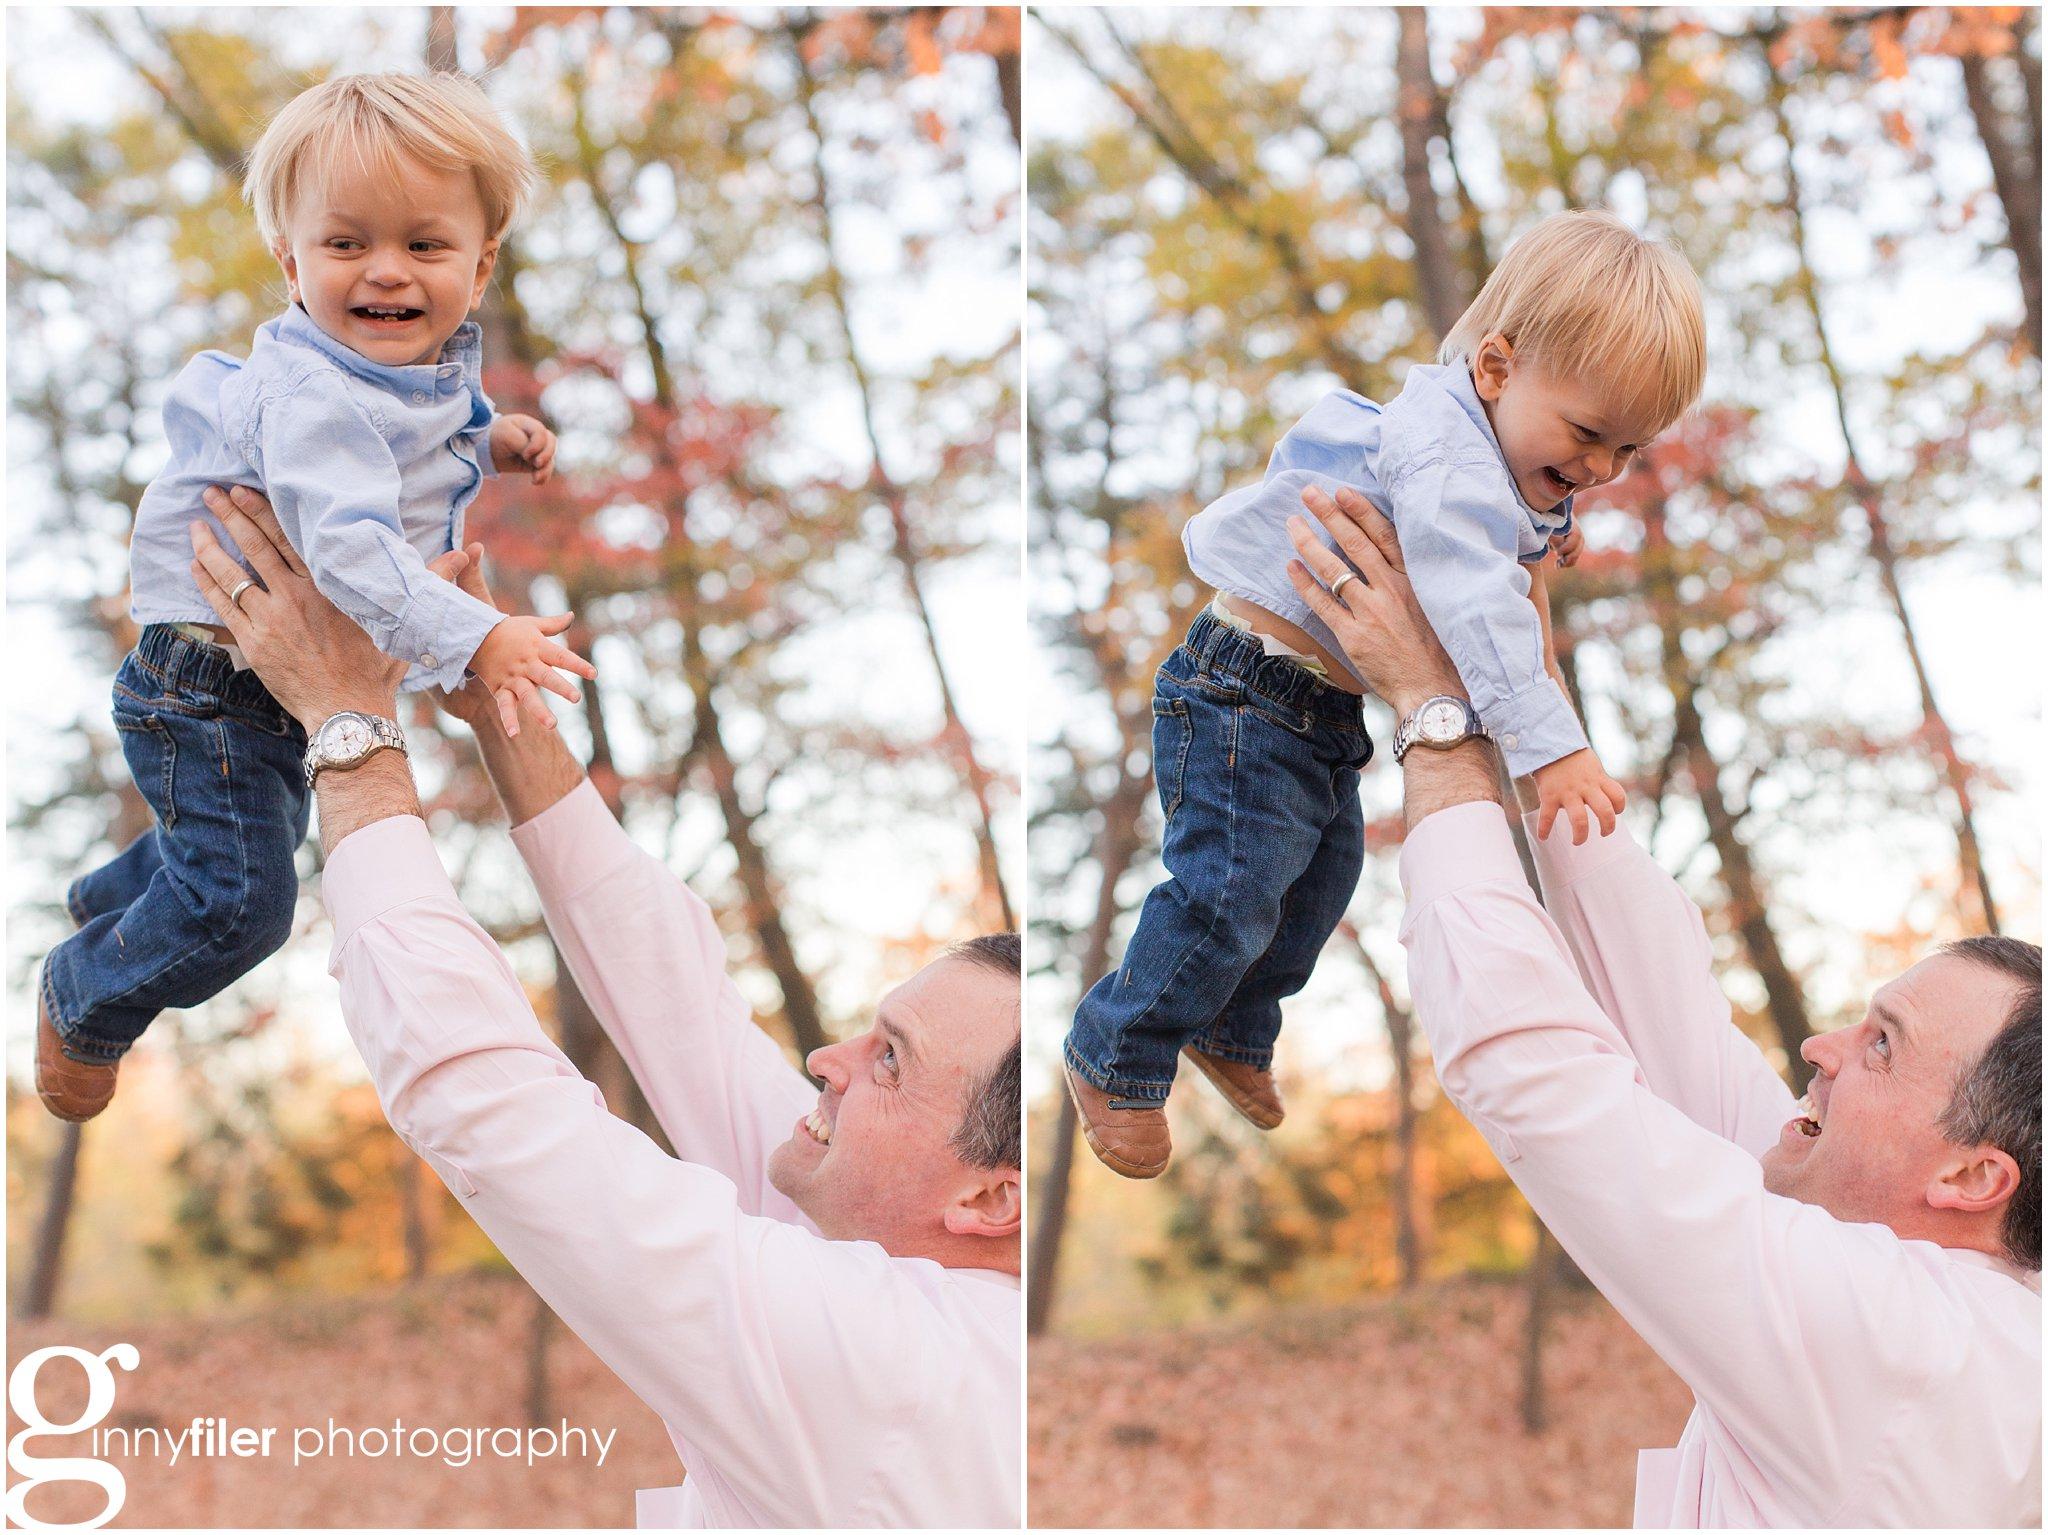 family_photography_Kennedy_0008.jpg